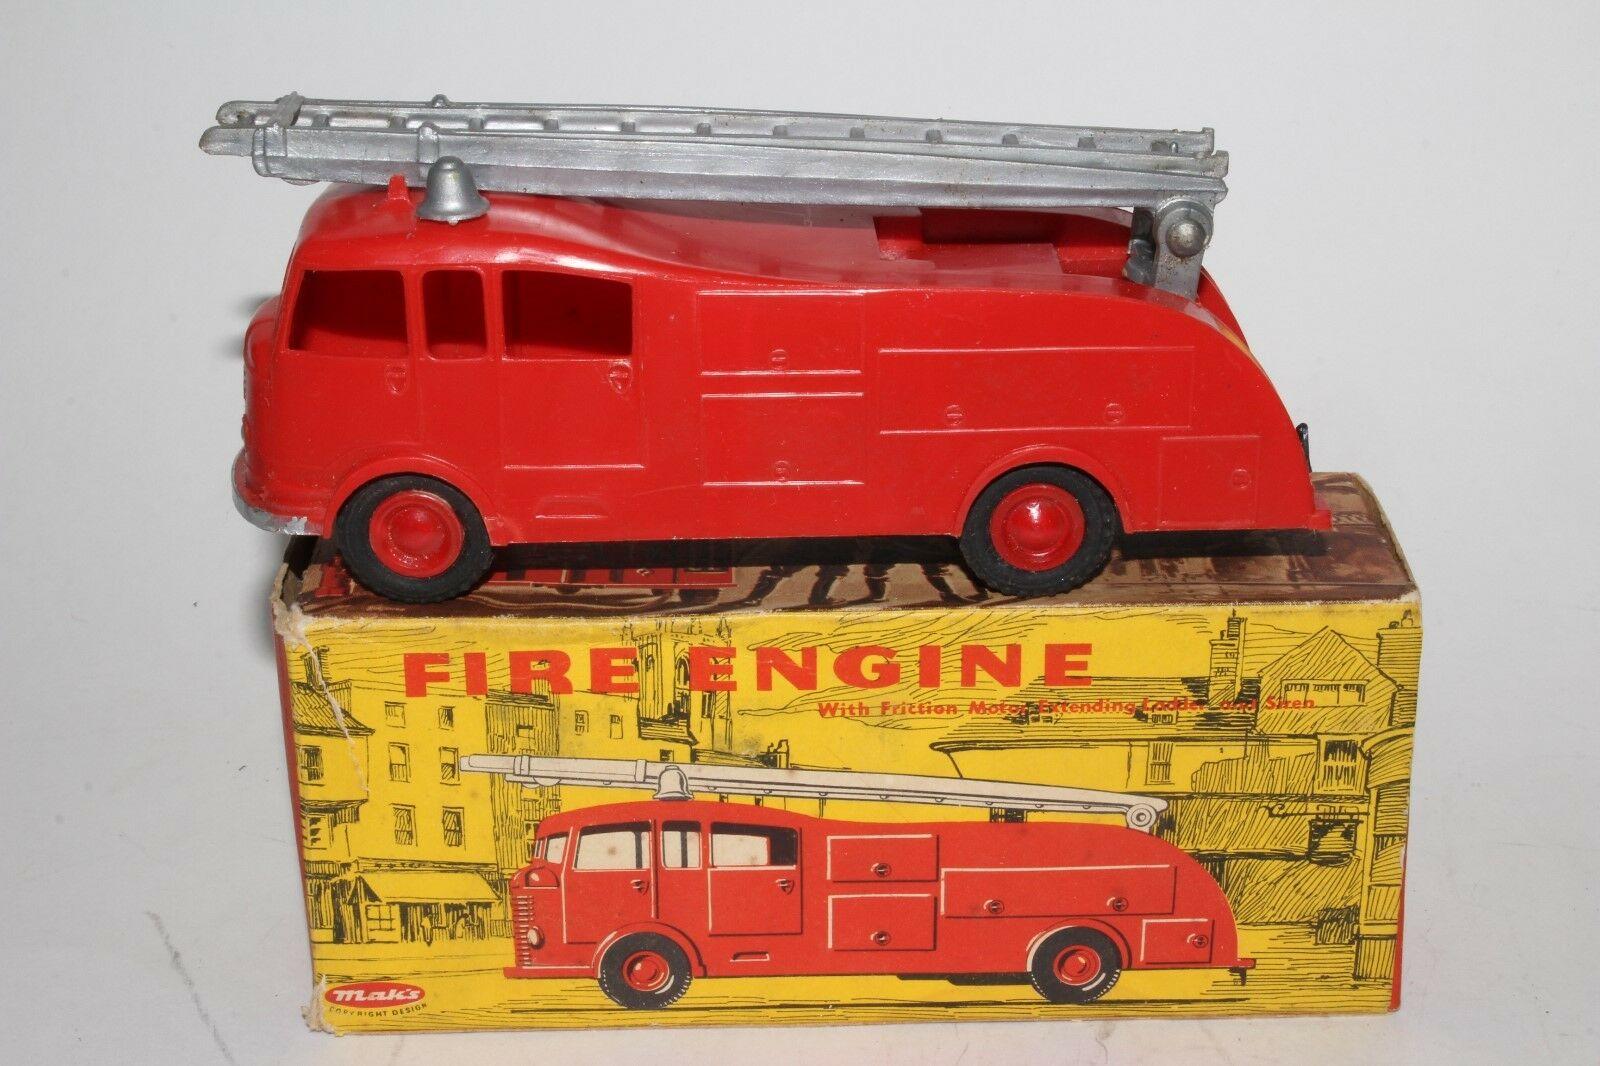 Maks-HK #2000 Commer Fire Engine - a Dinky Copy